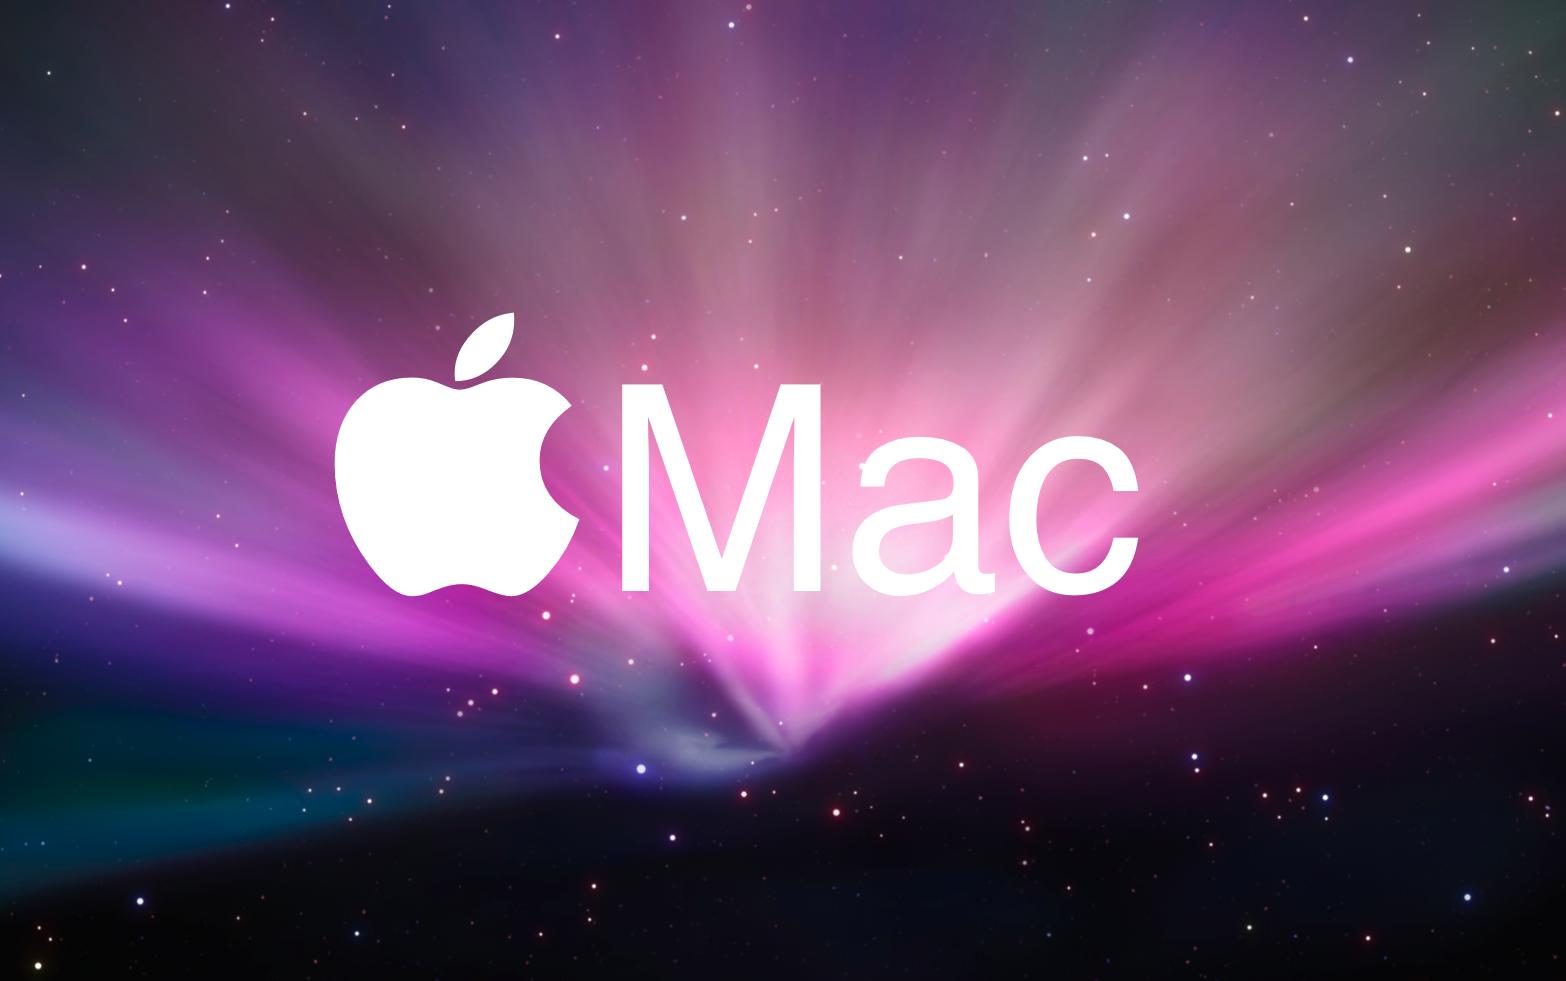 Macbook Air HD Wallpapers 2 Freetopwallpapercom 1566x981